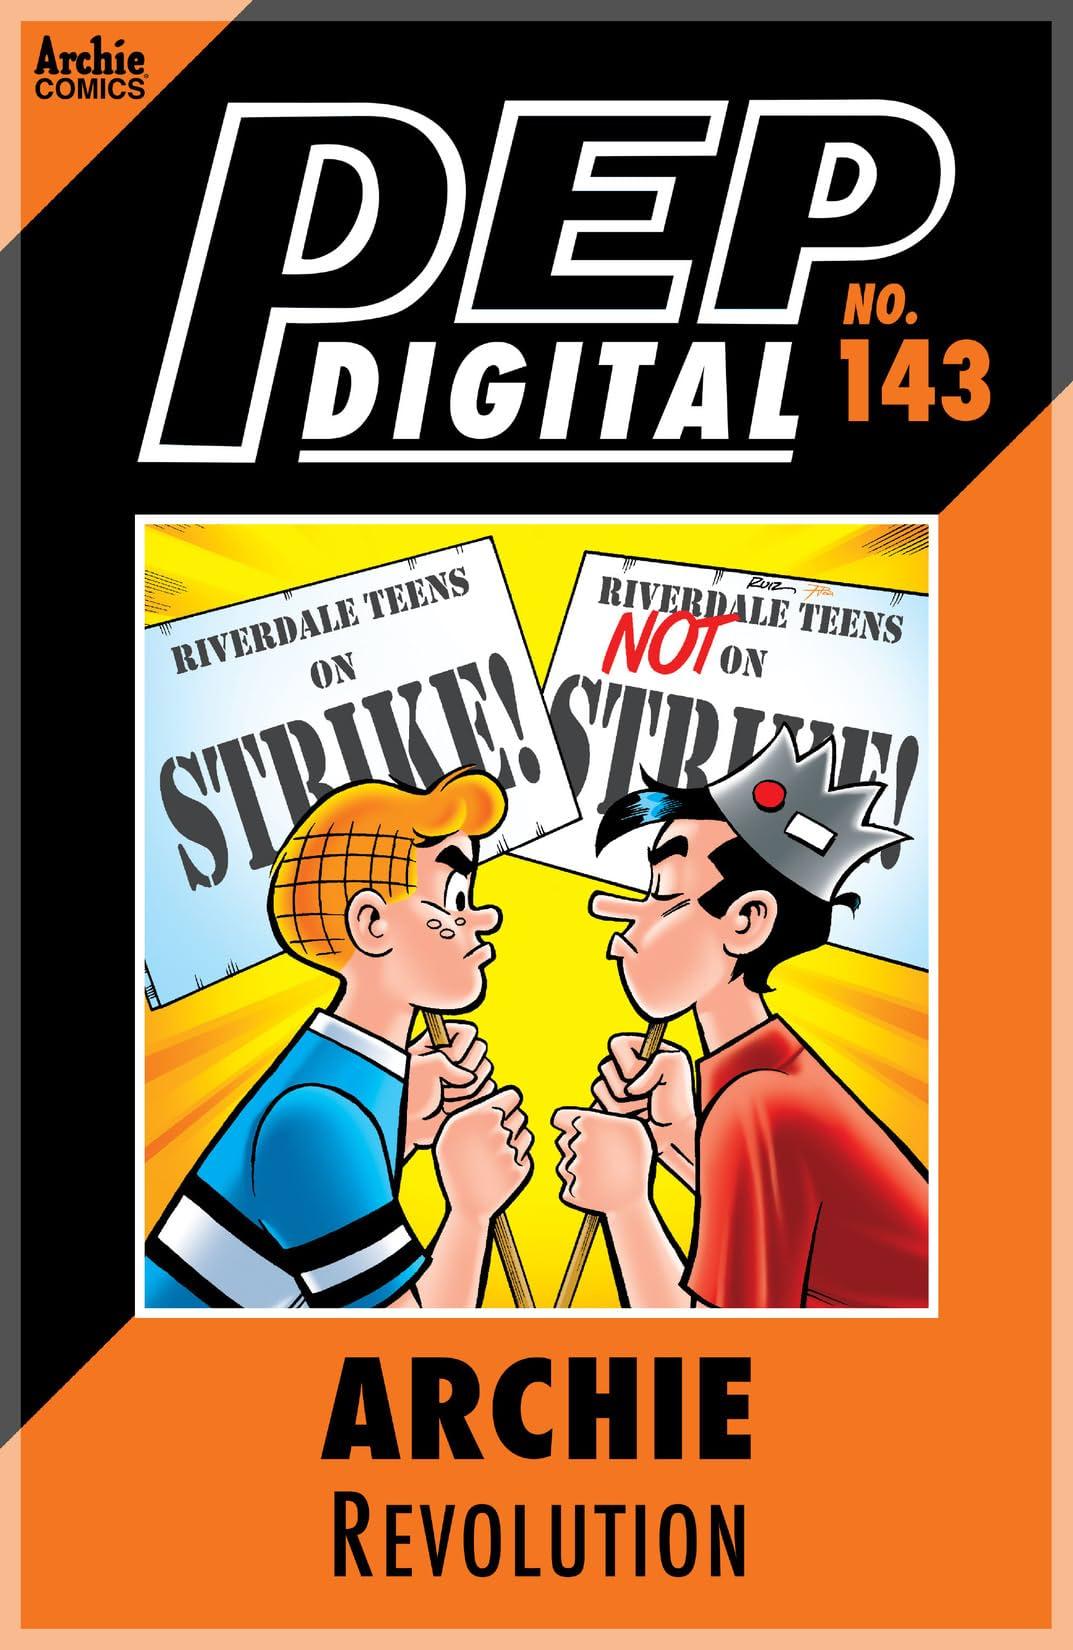 PEP Digital #143: Archie Revolution